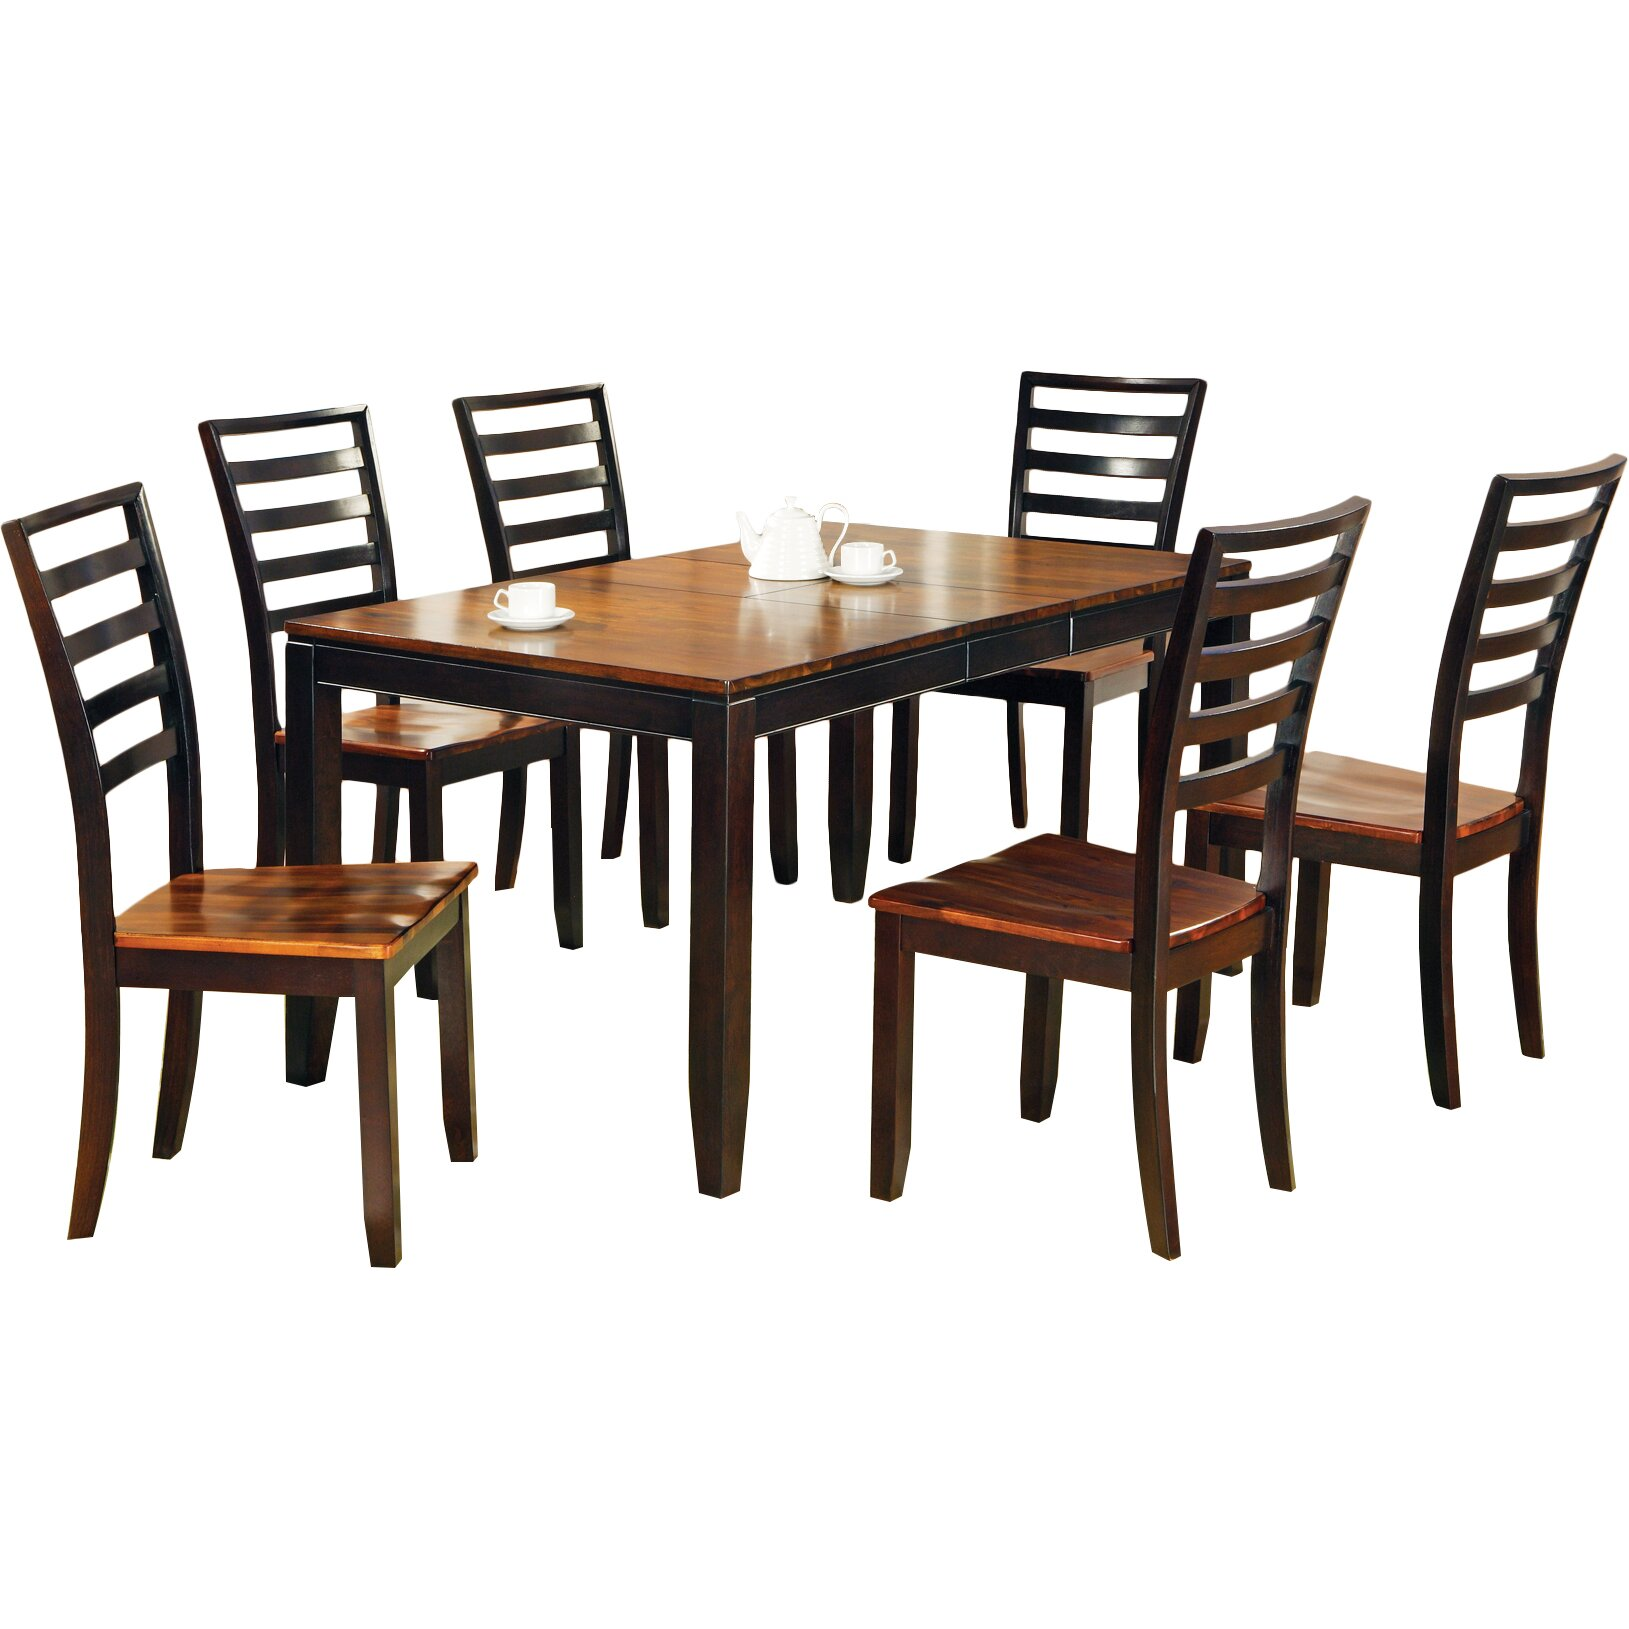 Loon peak matterhorn 7 piece dining set reviews wayfair for 7 piece dining set